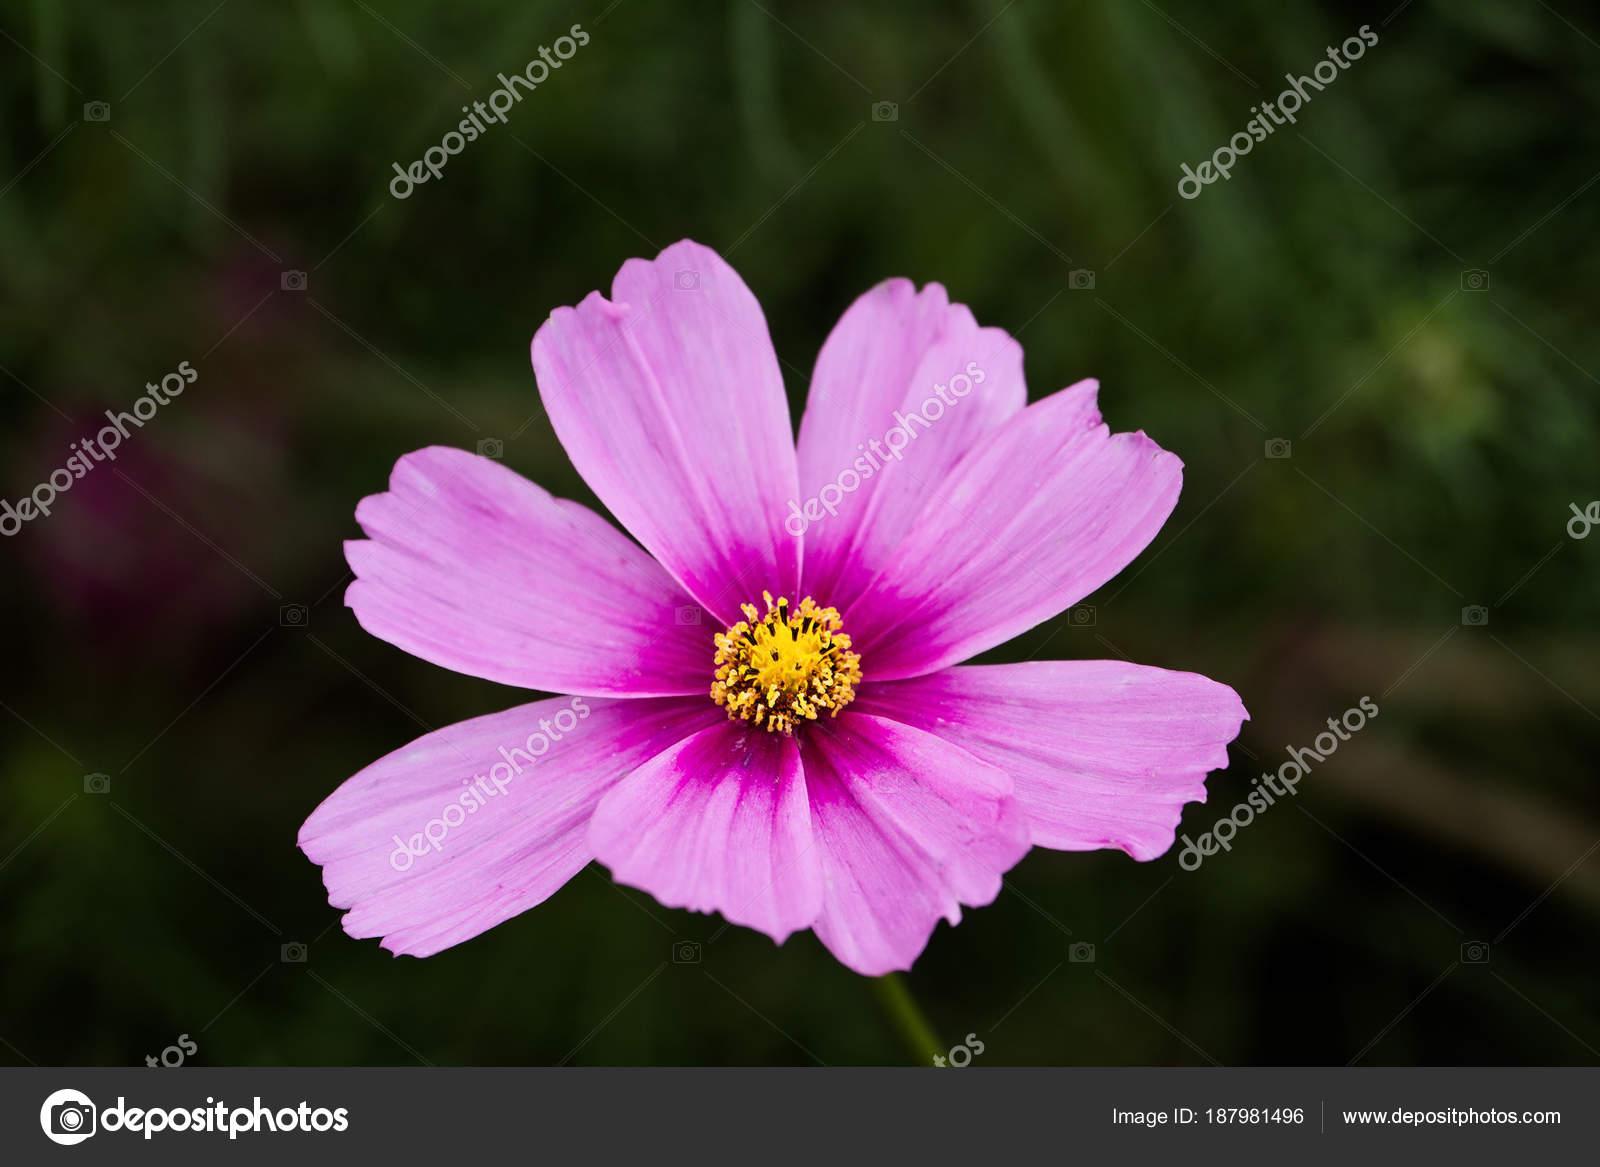 Cosmo flower stock photo stephaniefrey 187981496 a pink cosmos cosmos bipinnatus with extreme shallow depth of field photo by stephaniefrey mightylinksfo